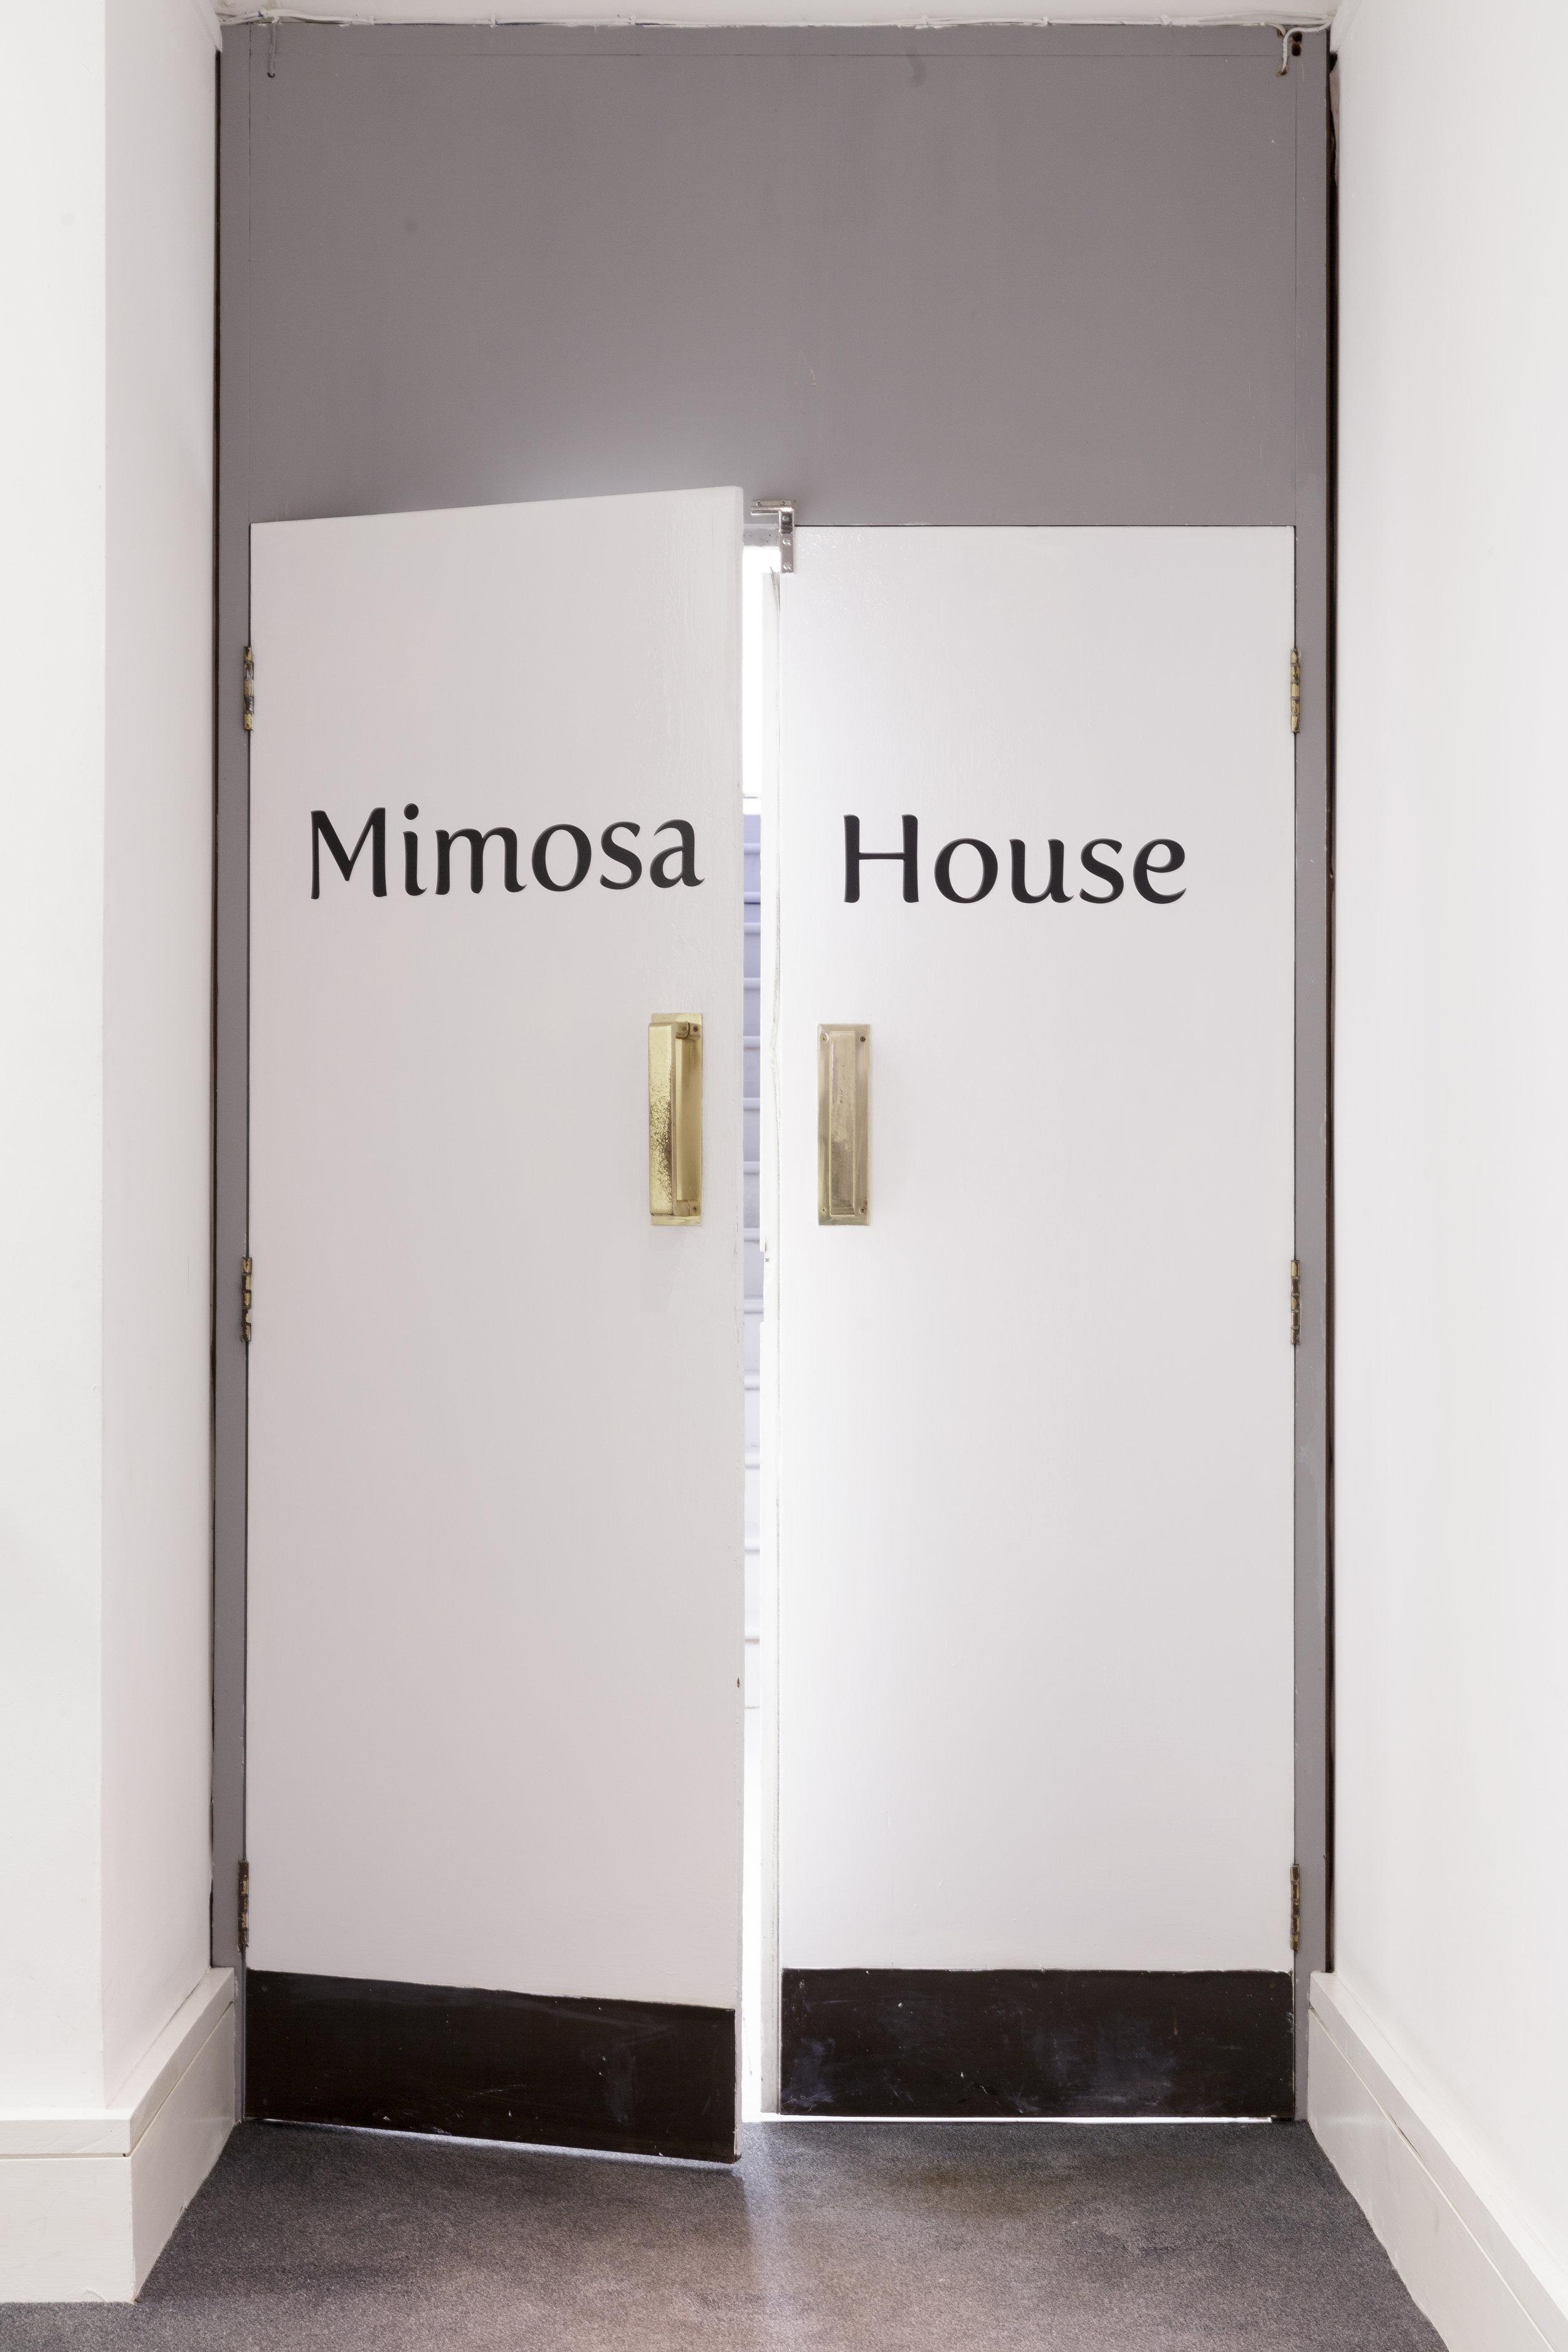 Mimosa House interior entrance, Photo: Tim Bowditch.